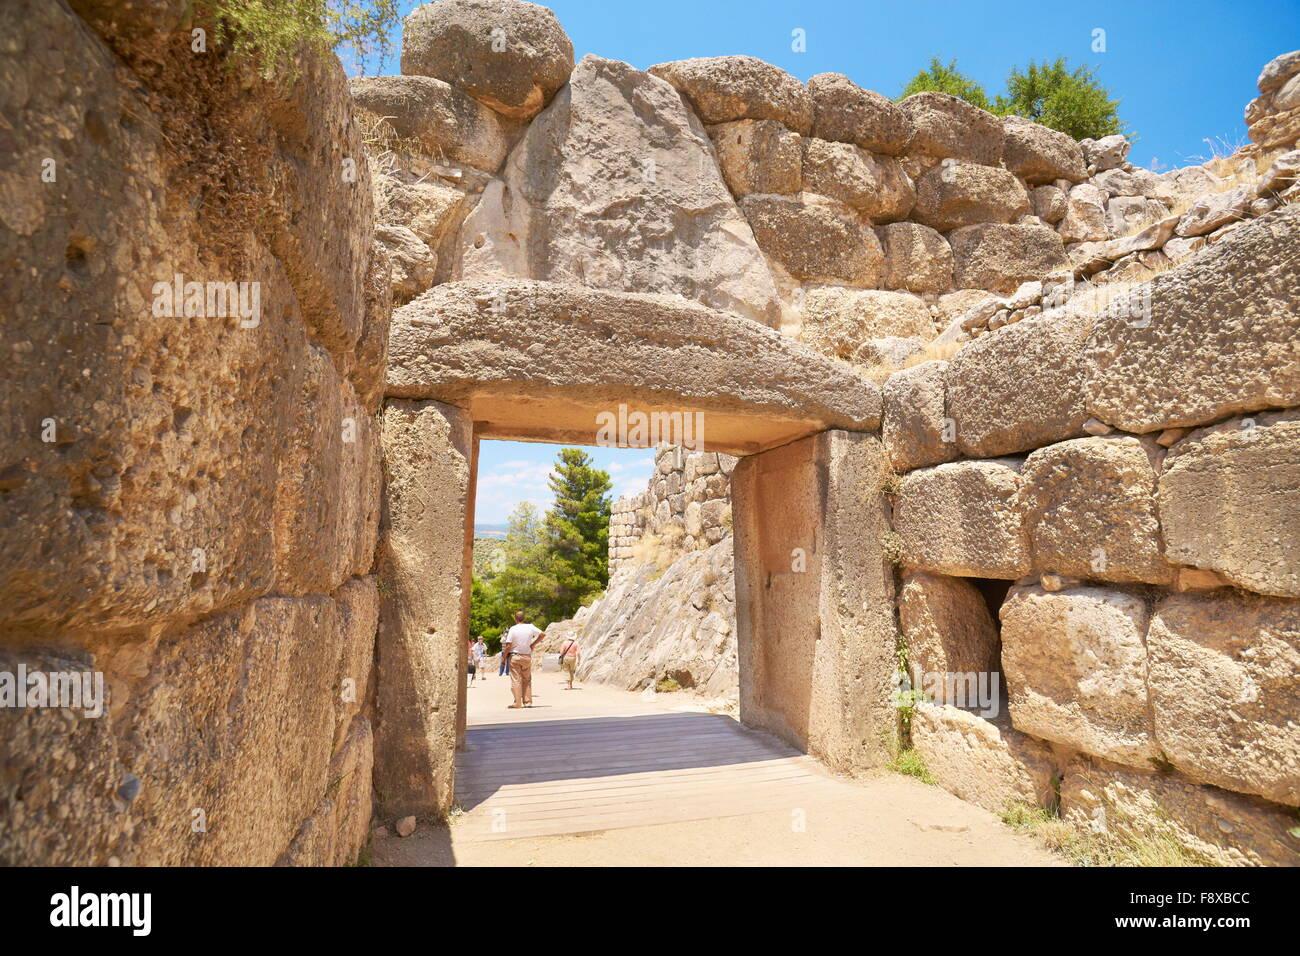 Ancient city of Mycenae, Lion gate wall around the akropolis of Mykene, Peloponnese, Greece - Stock Image